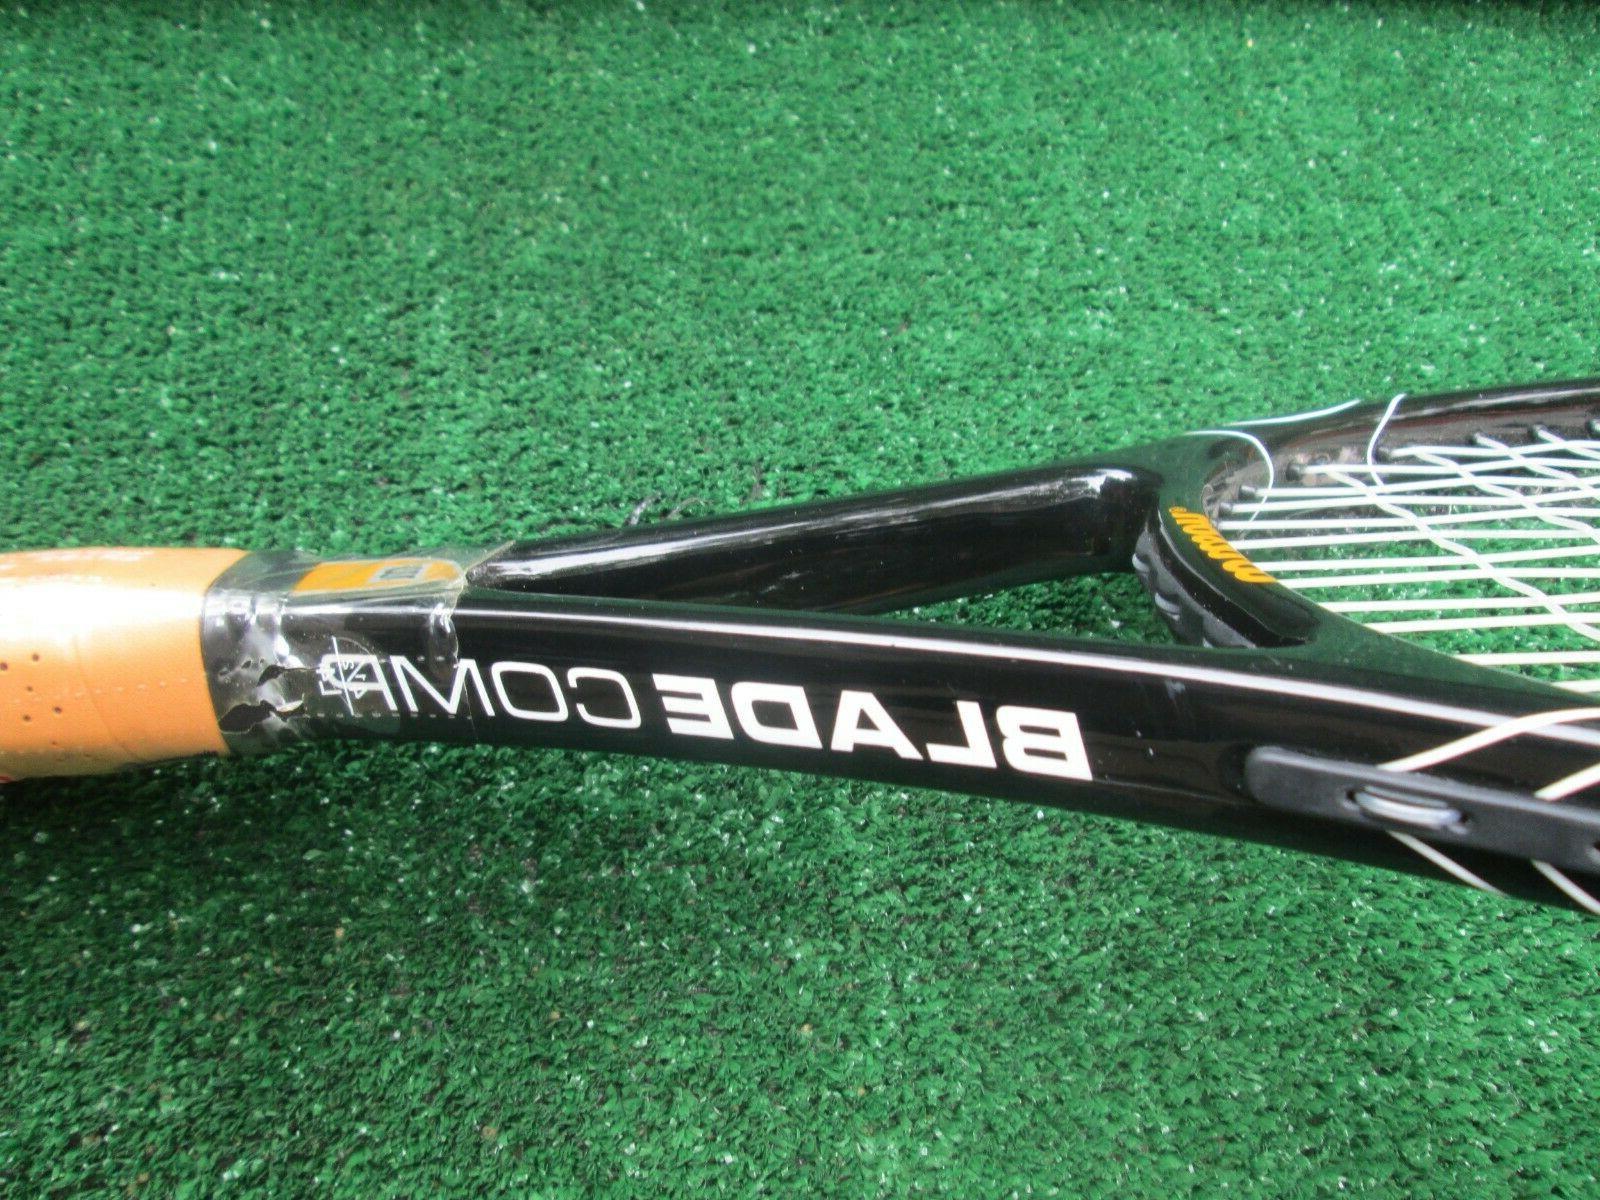 tennis new blade comp tennis racket 4